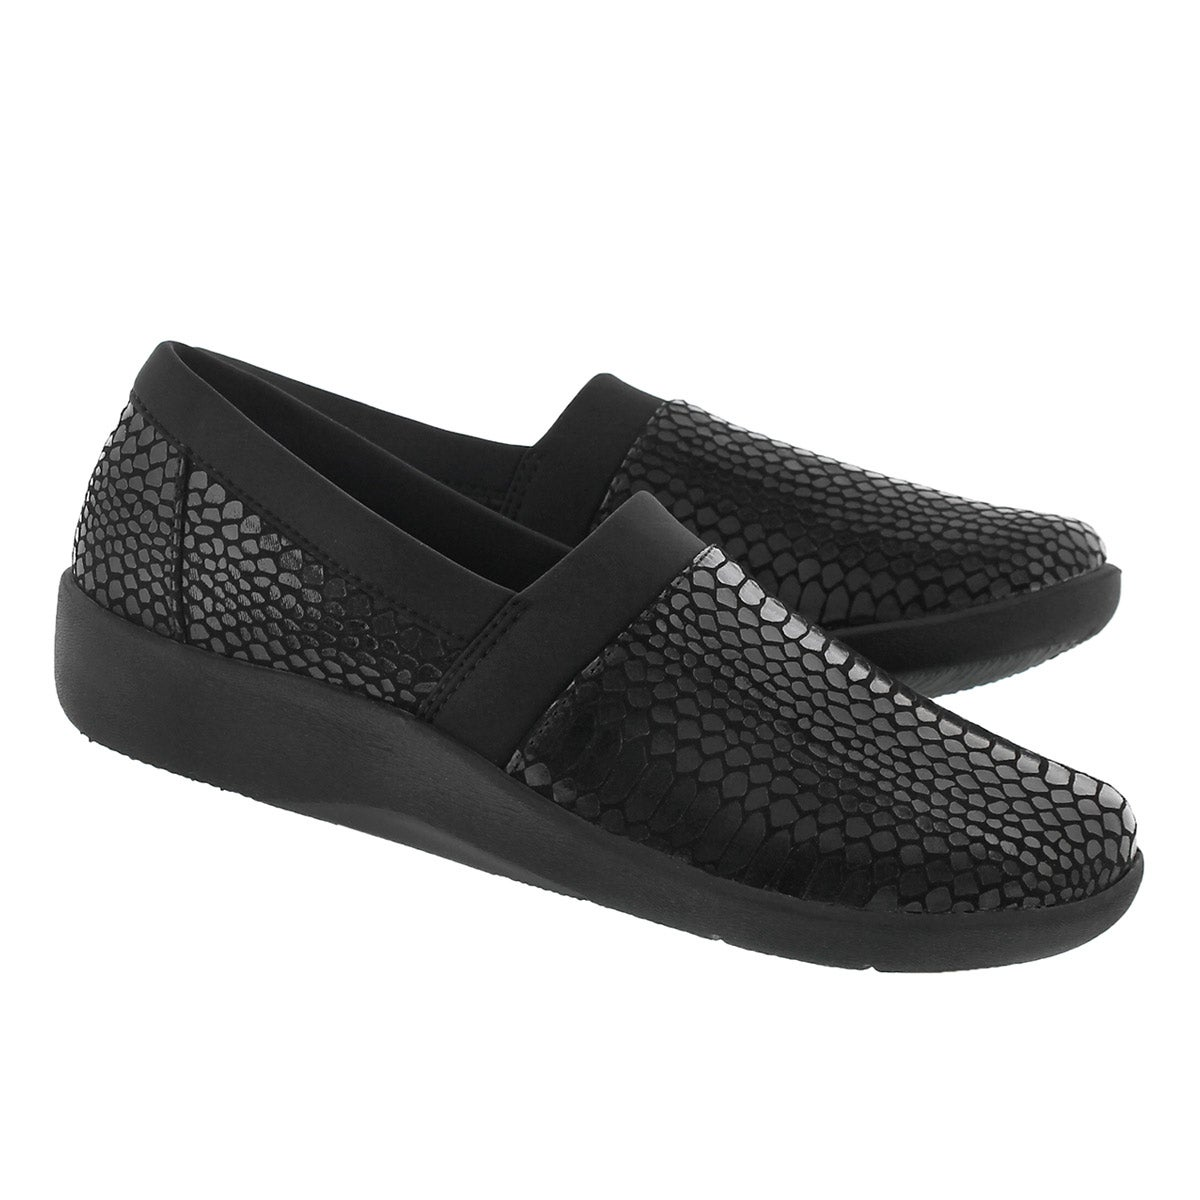 Lds Sillian Blair blk snk slip on loafer